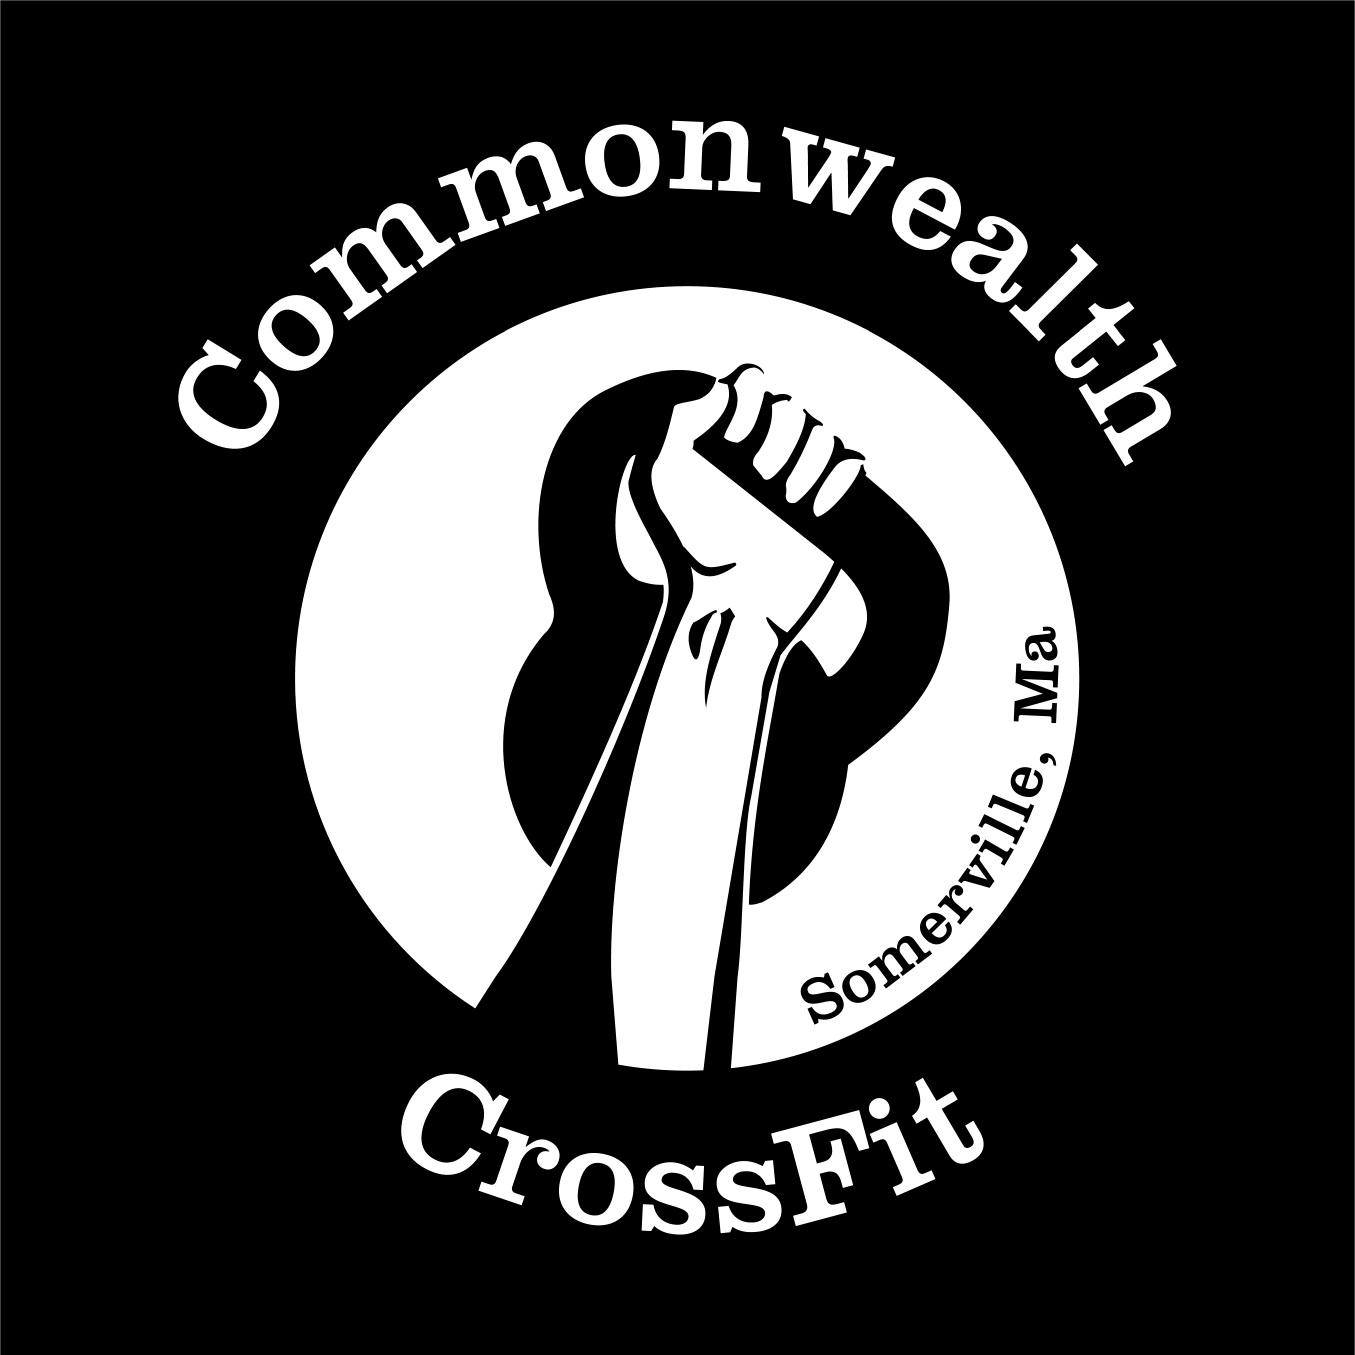 Commonwealth CrossFit logo